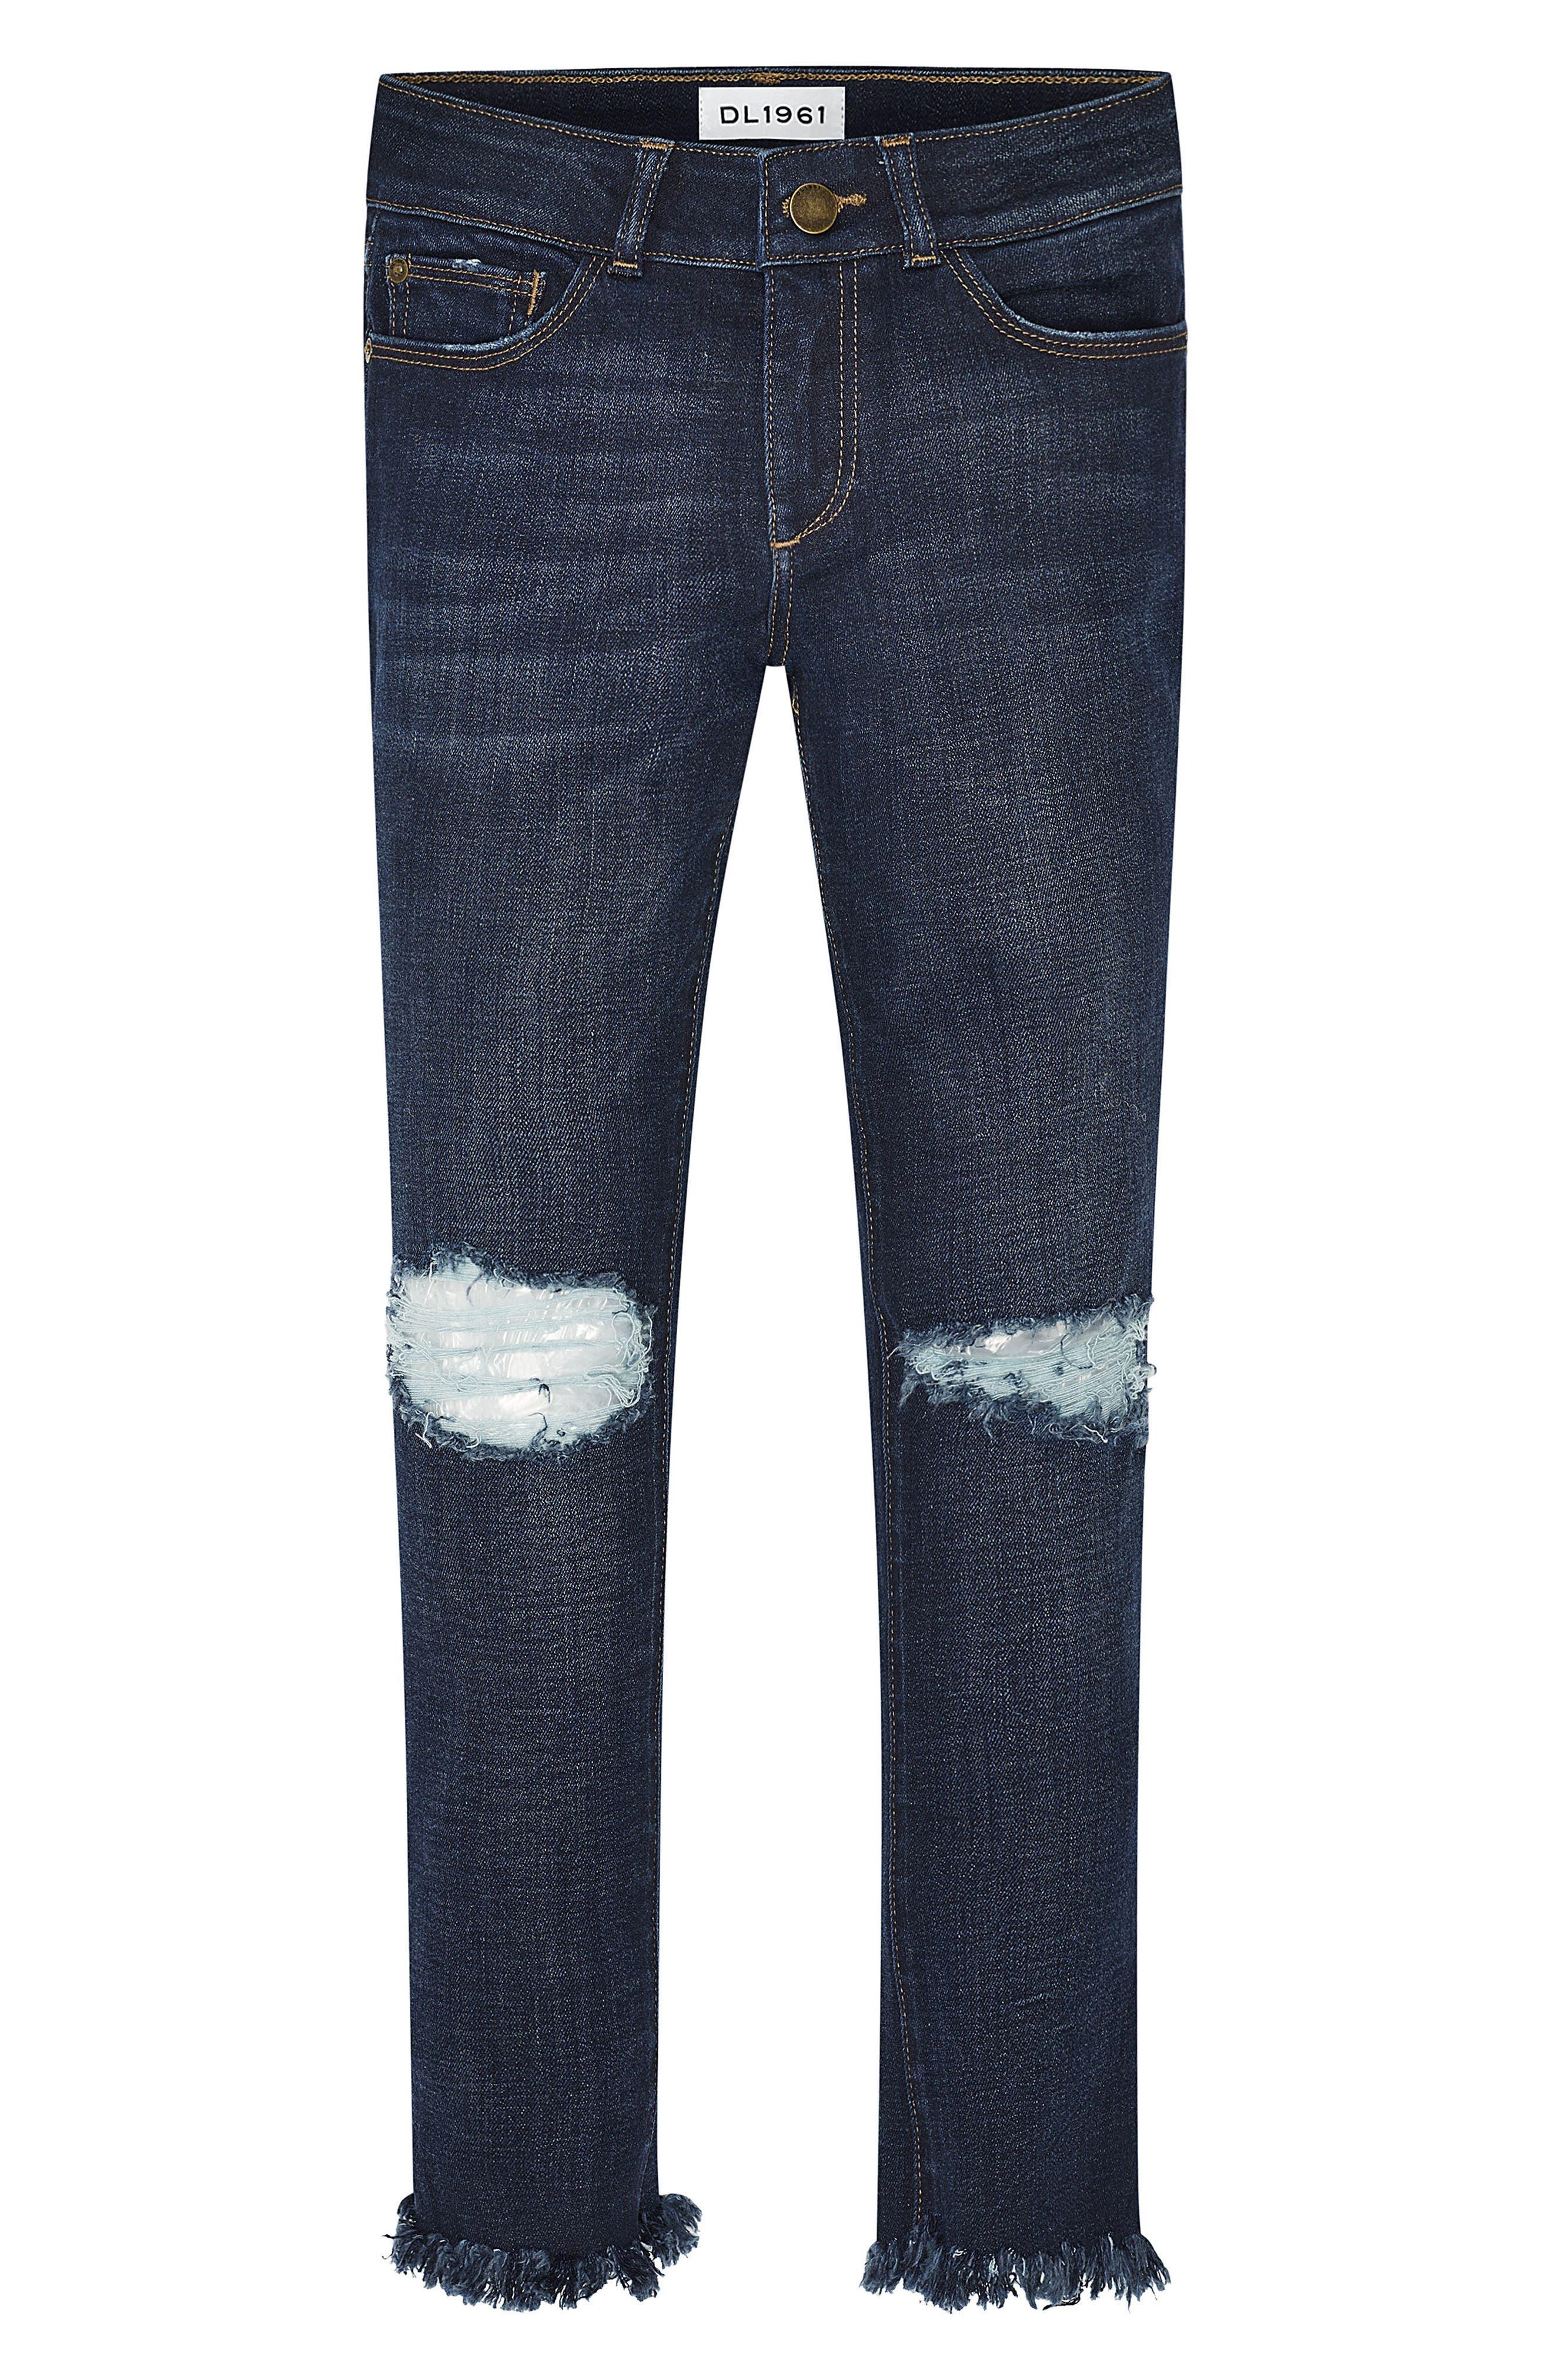 Main Image - DL1916 Chloe Distressed Skinny Jeans (Big Girls)